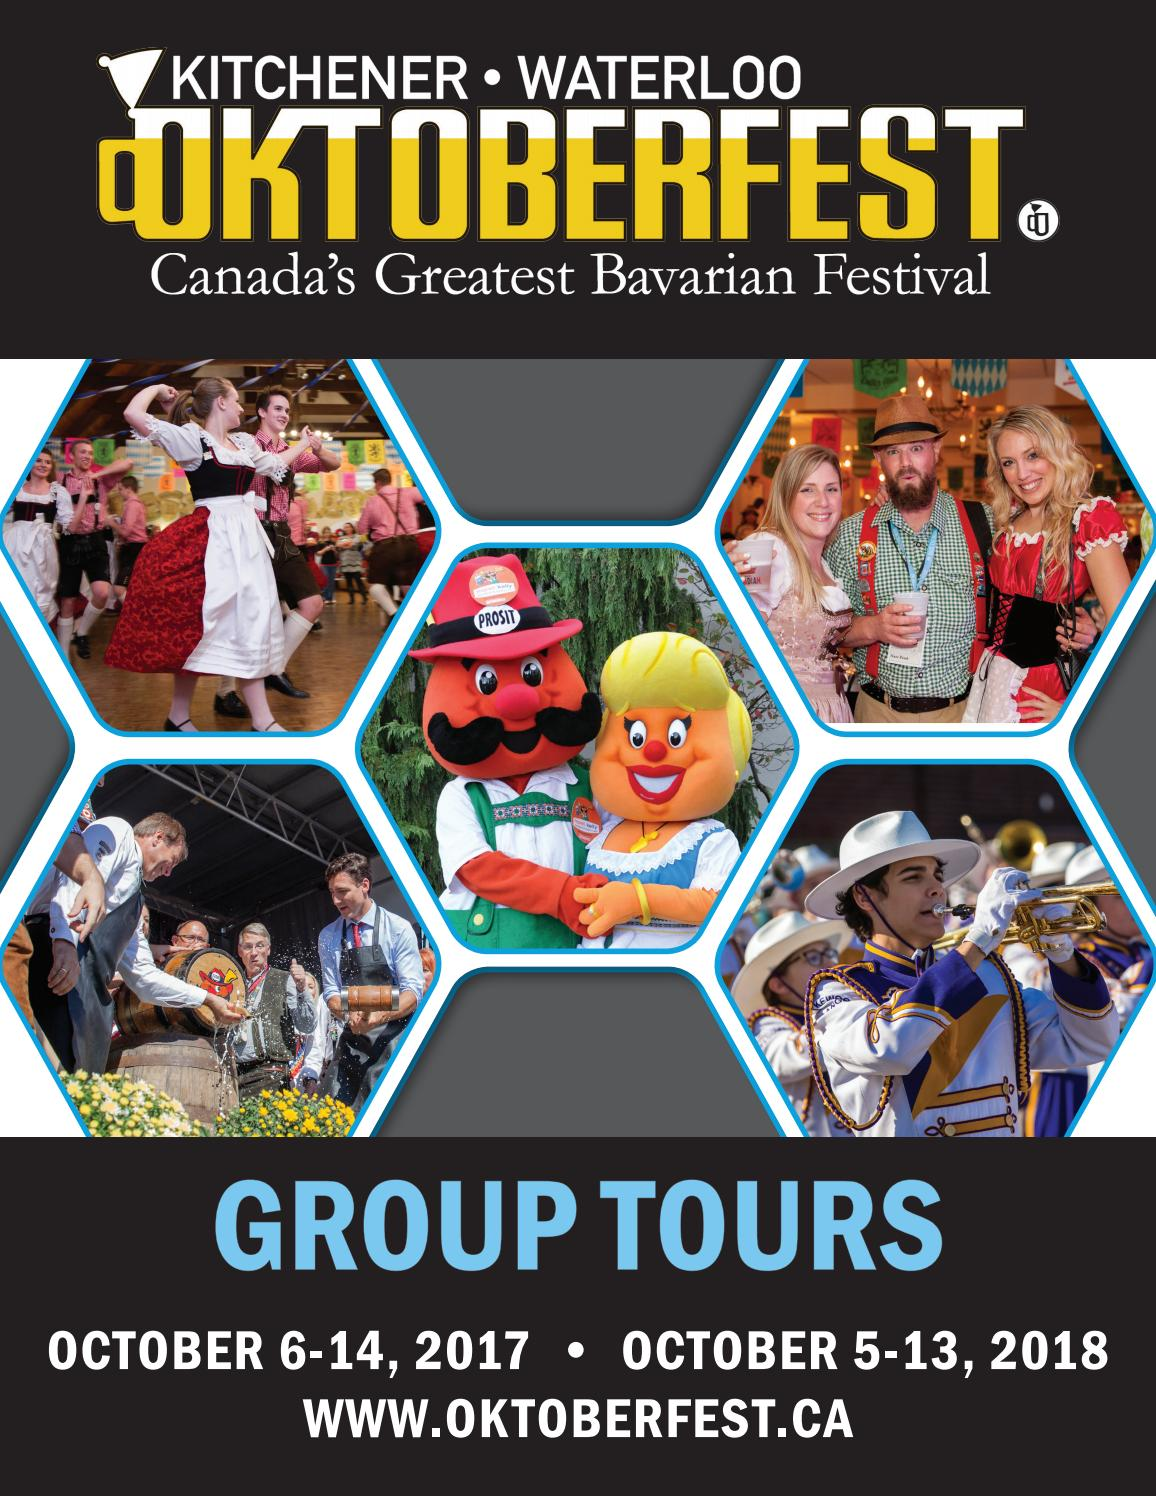 oktoberfest kitchener events